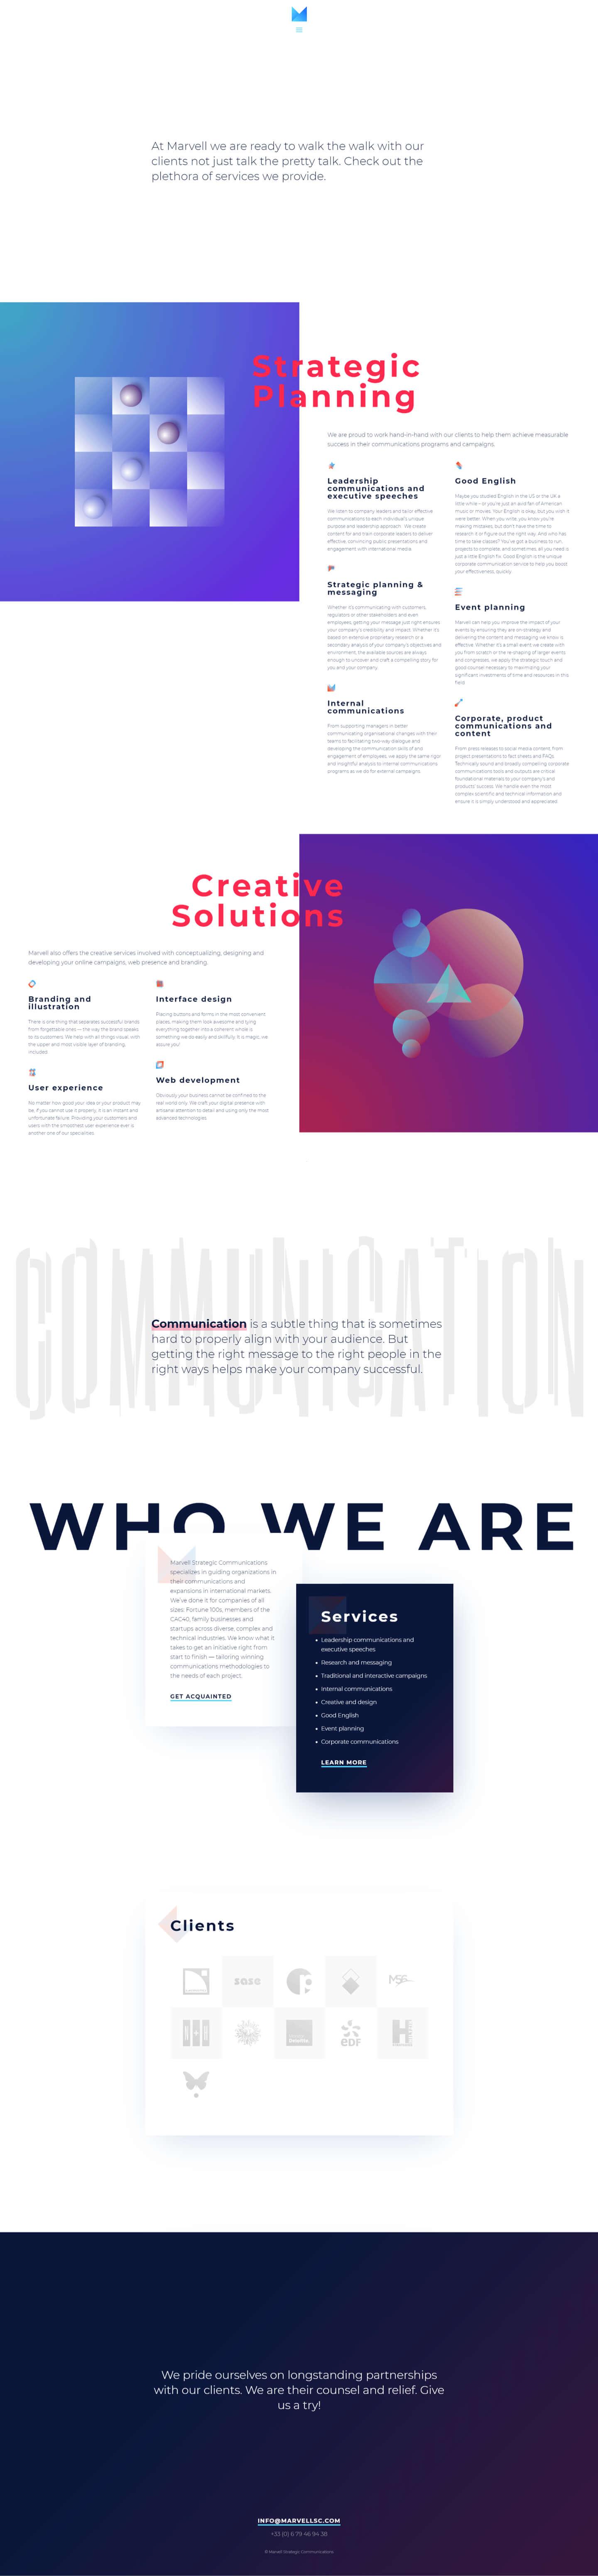 Finsweet Webflow development for Marvel Strategic Communications